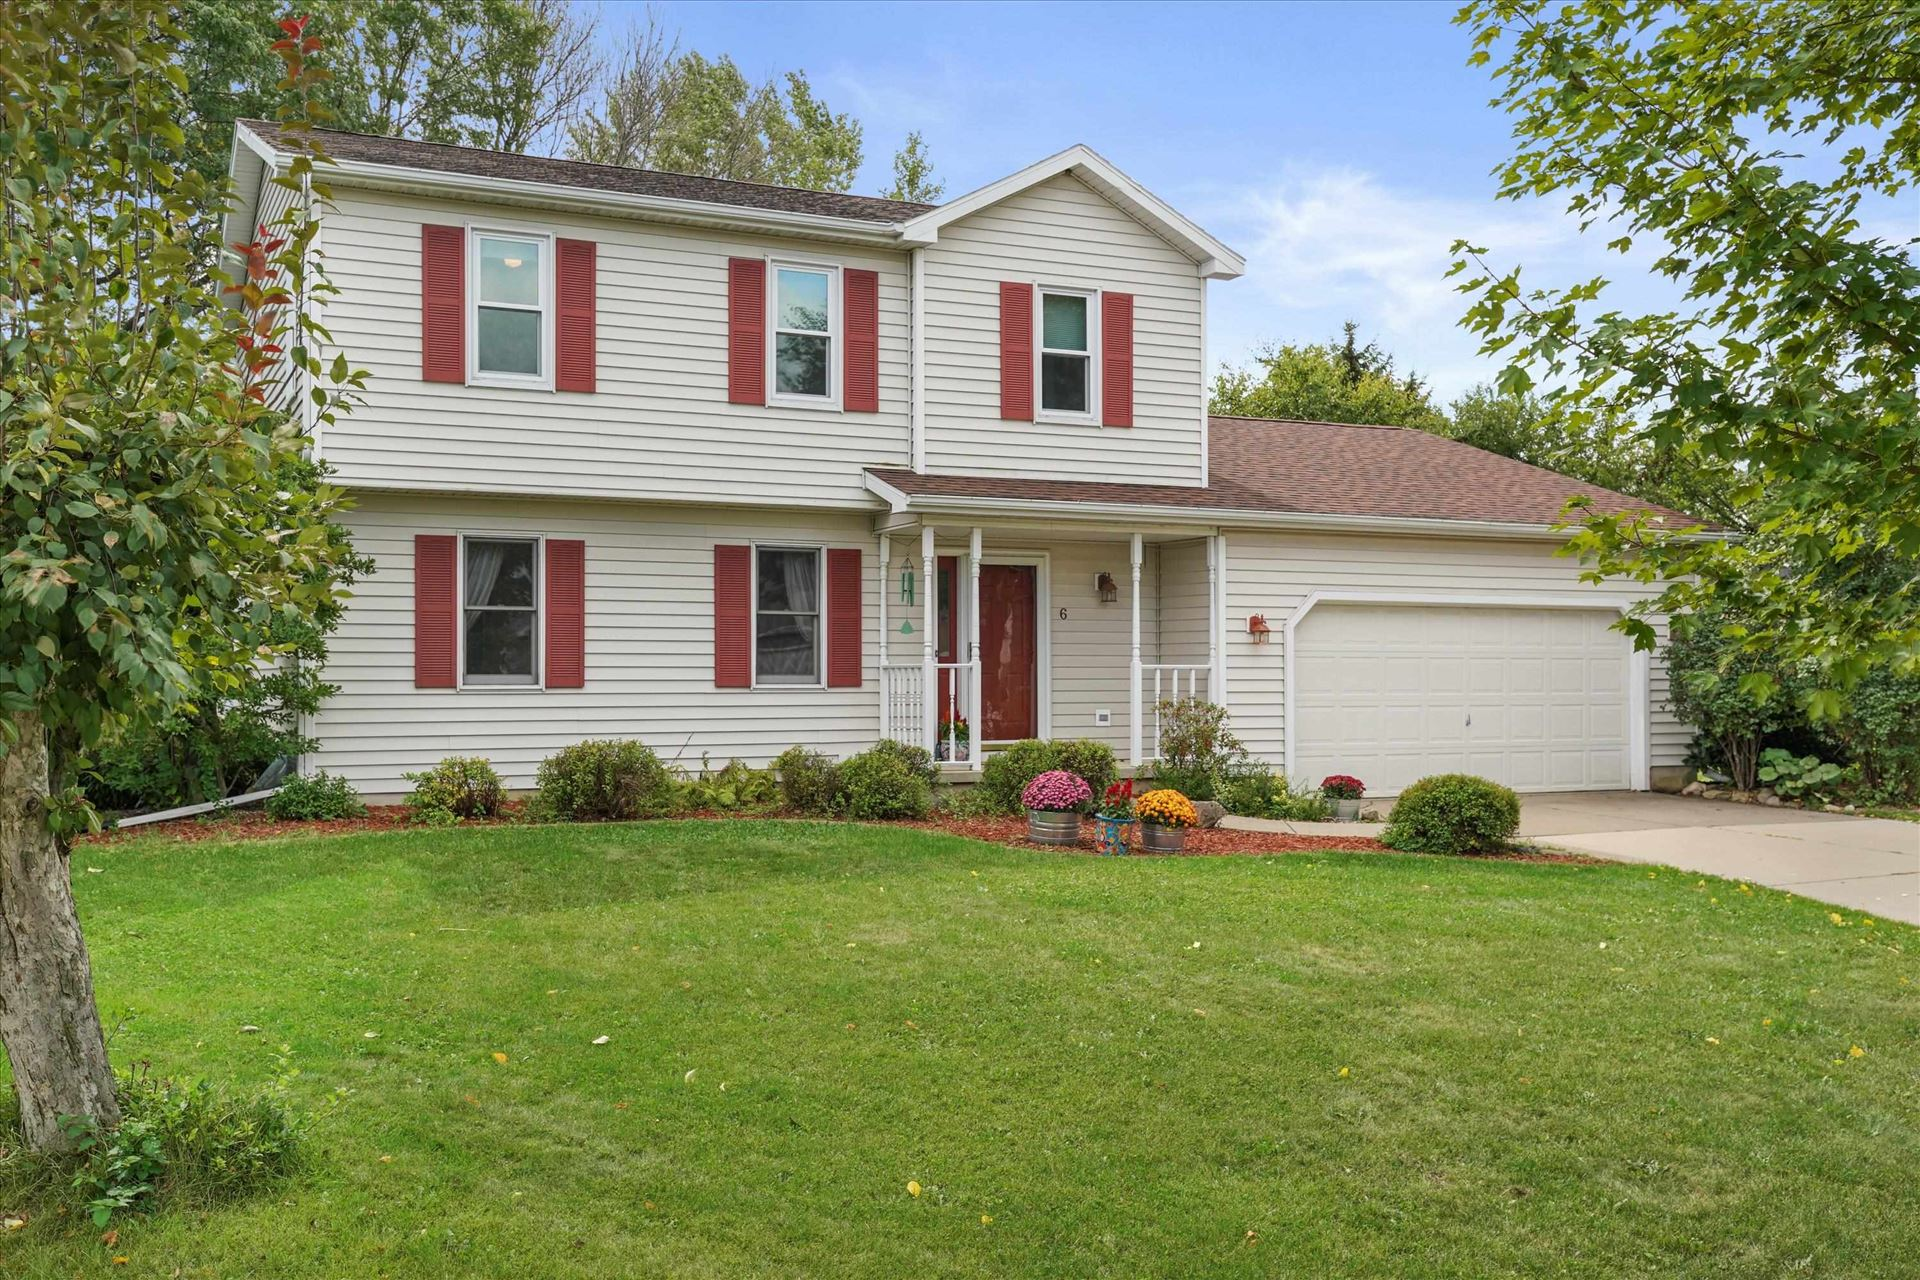 6 Homewood Cir, Madison, WI 53704 - #: 1919871